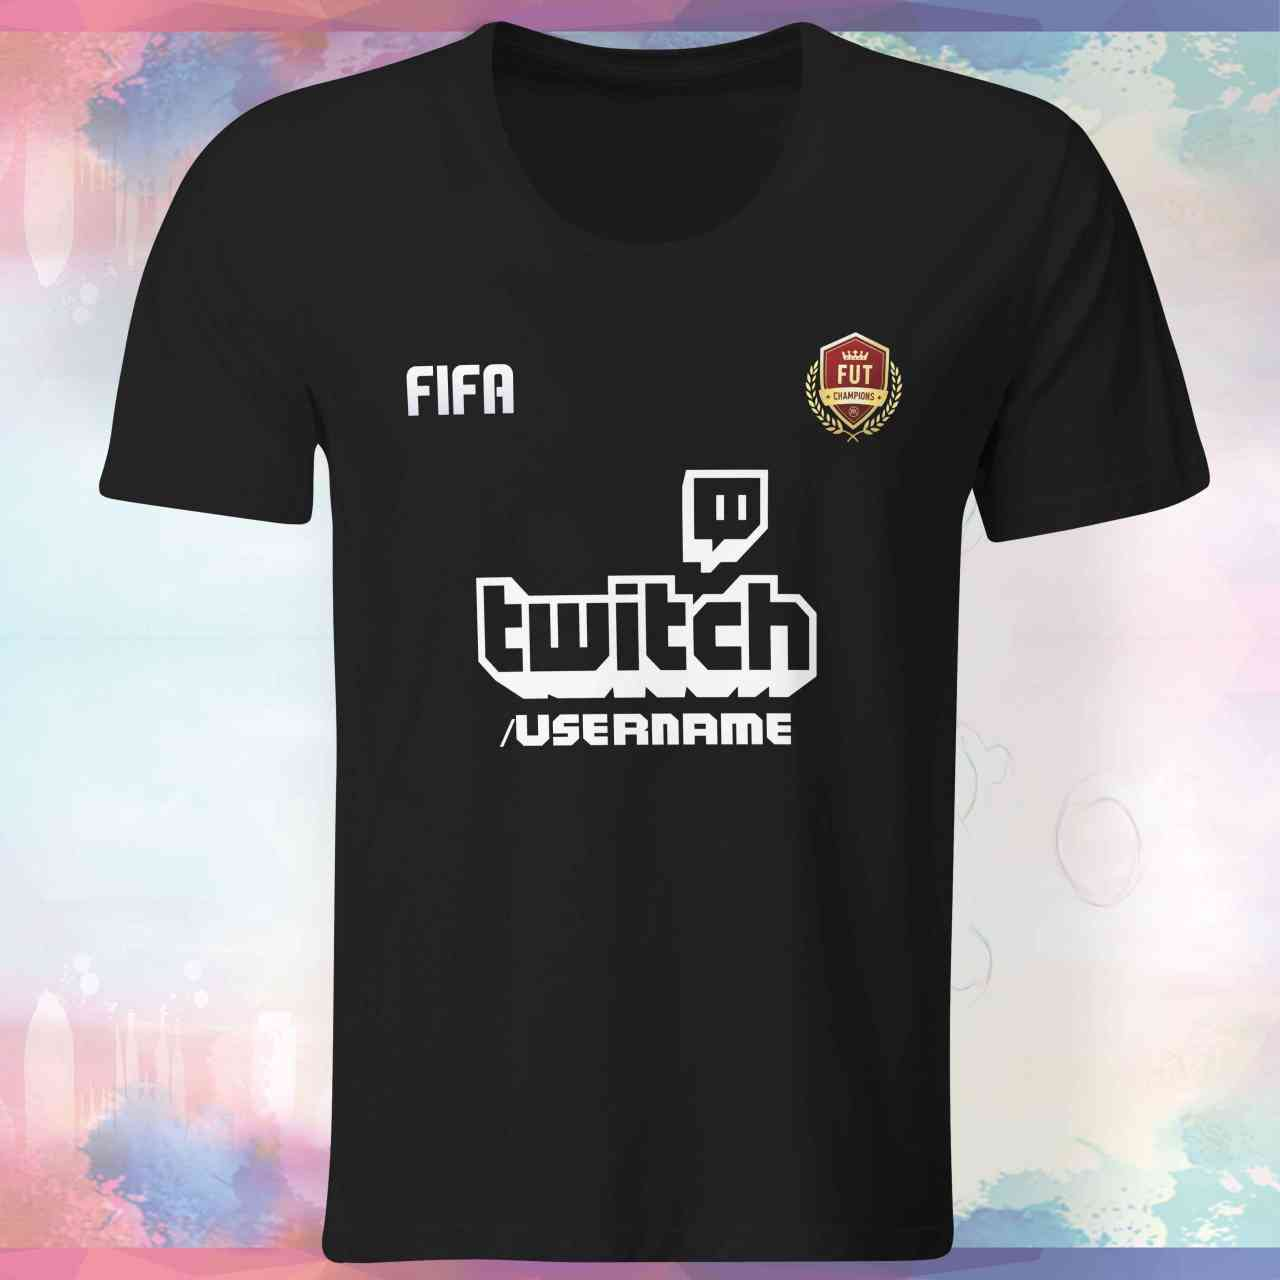 Fifa Twitch - Shirt mit Username | pickNstick